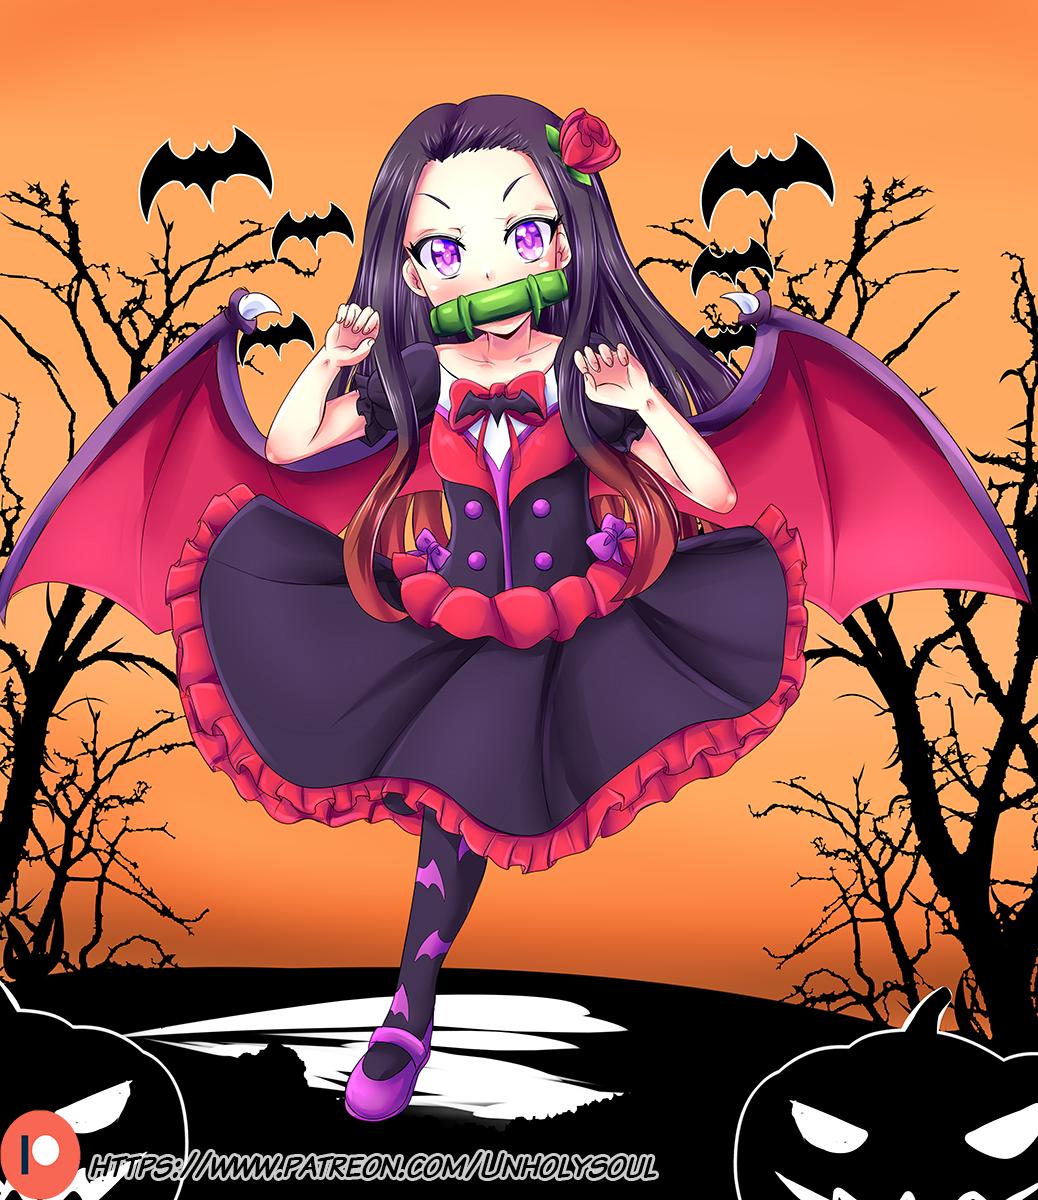 nezuko_color_452016.png